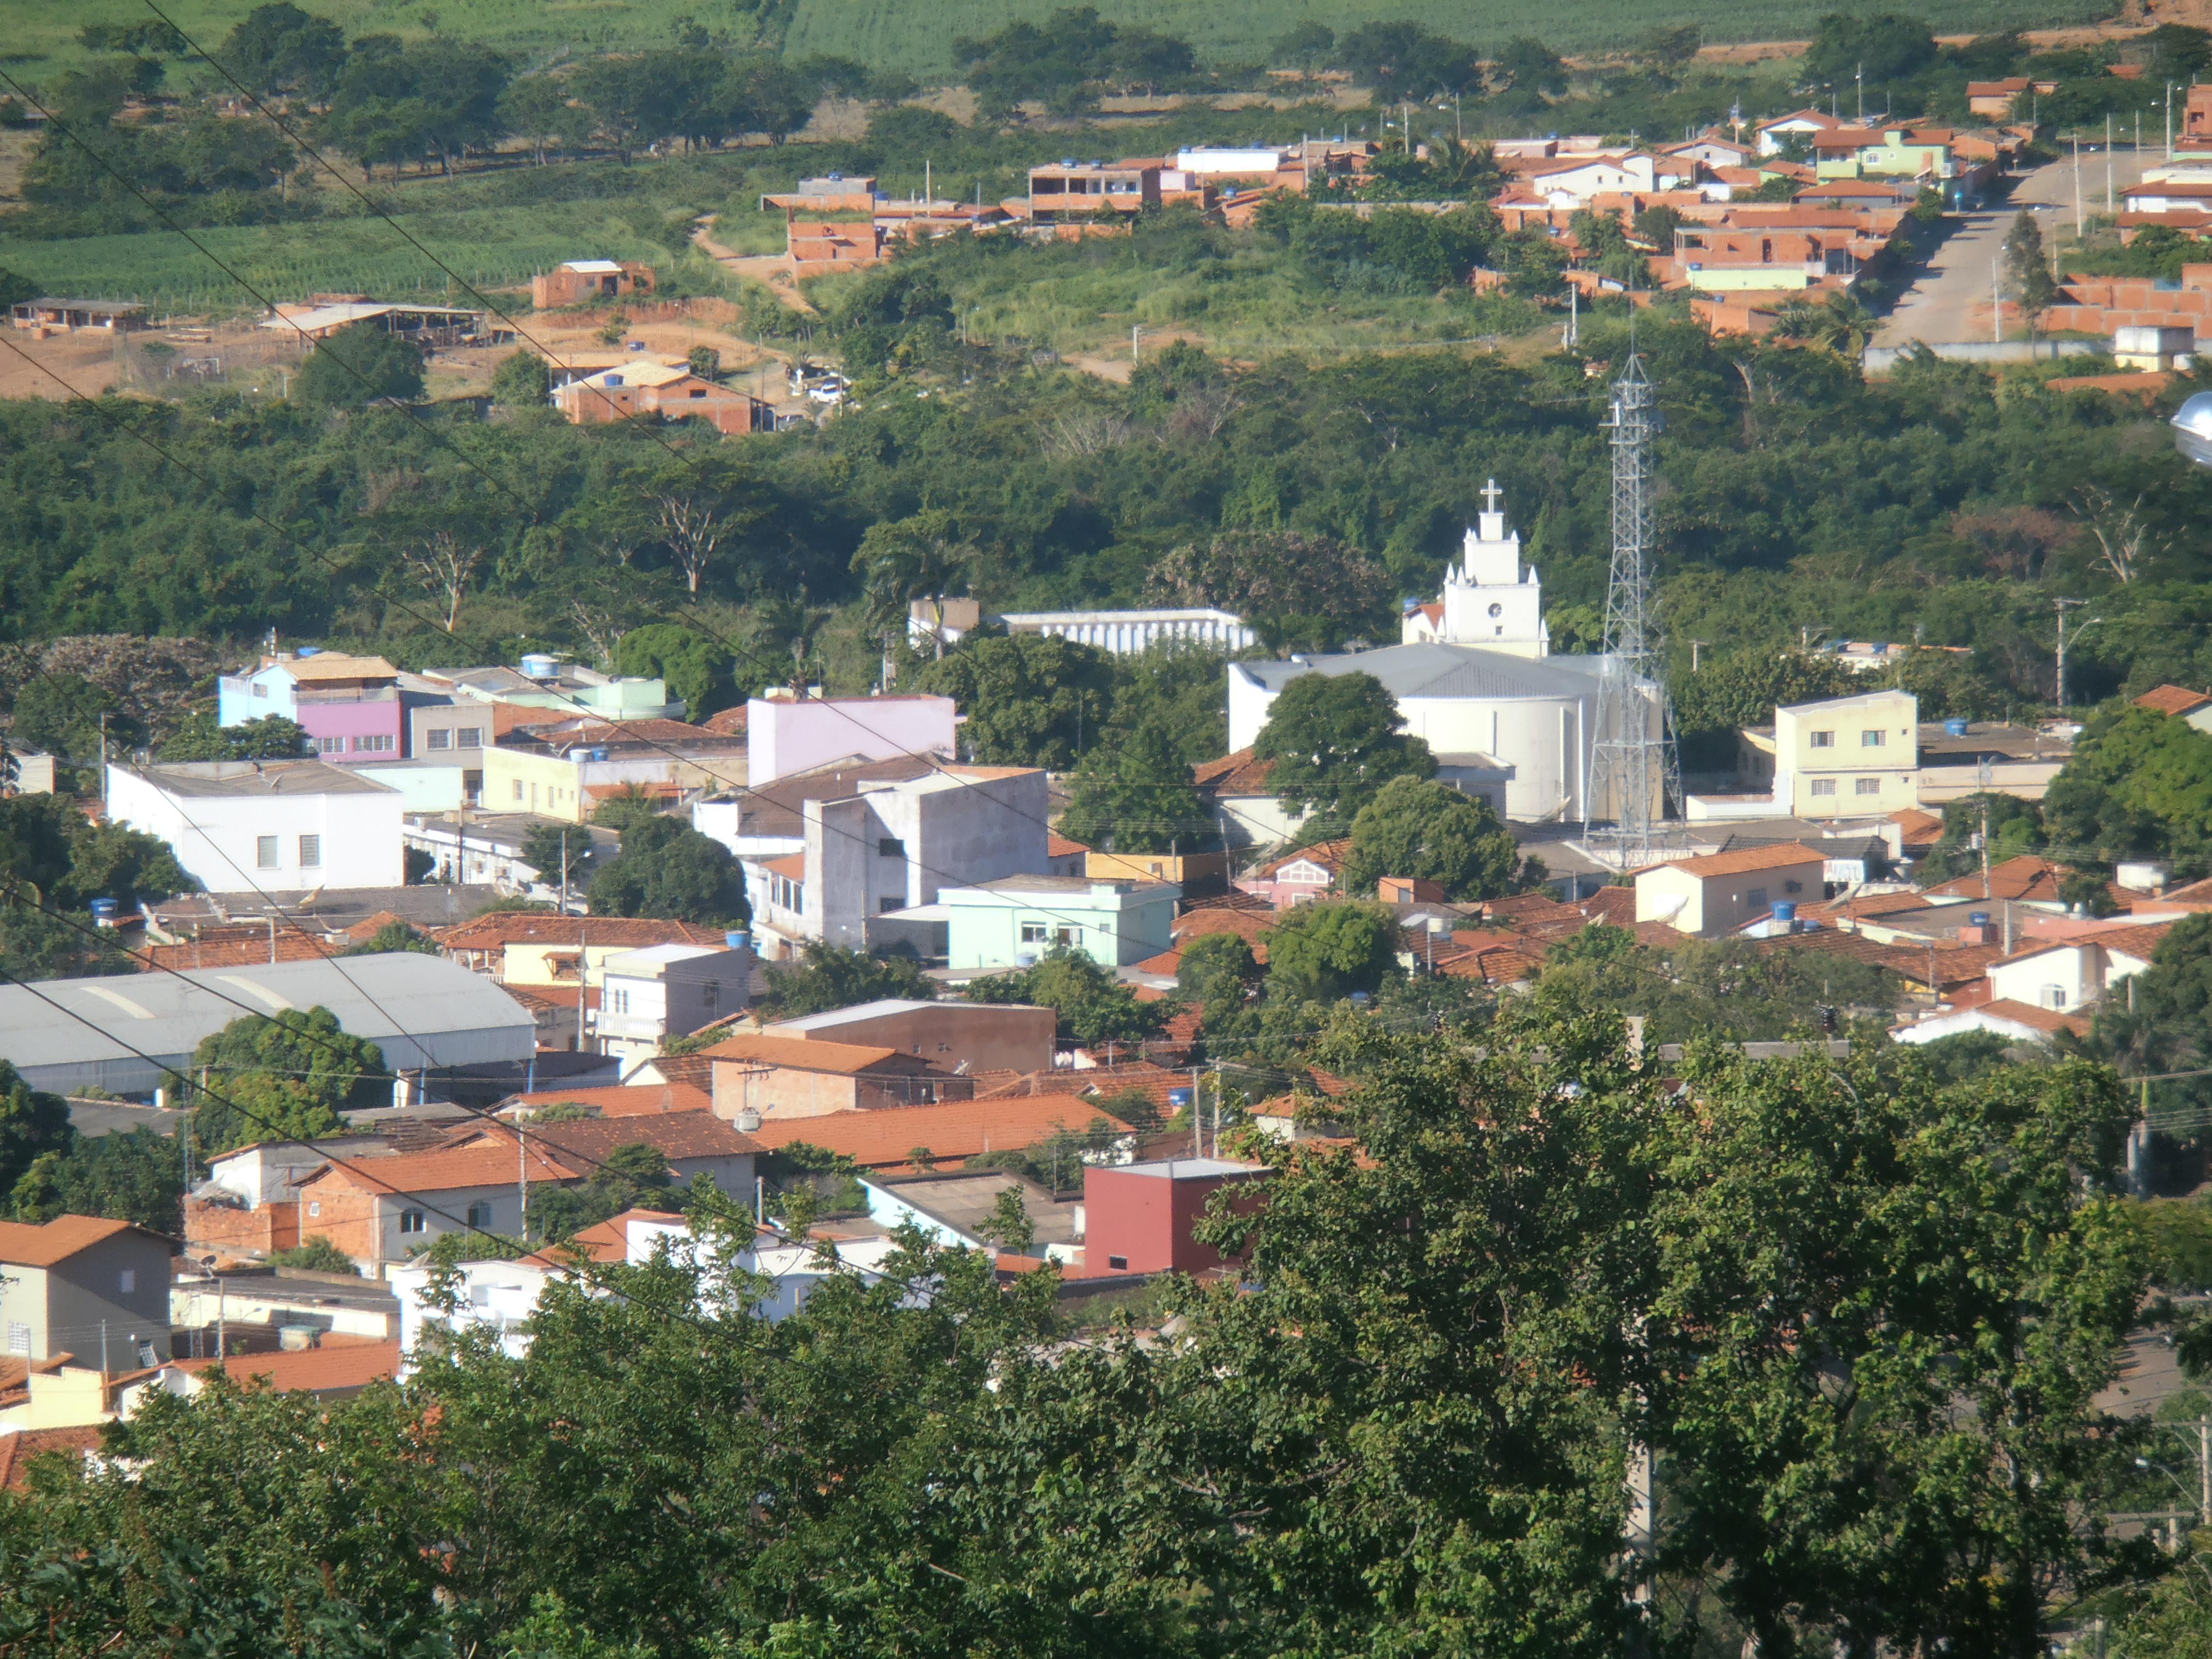 Francisco Sá Minas Gerais fonte: upload.wikimedia.org